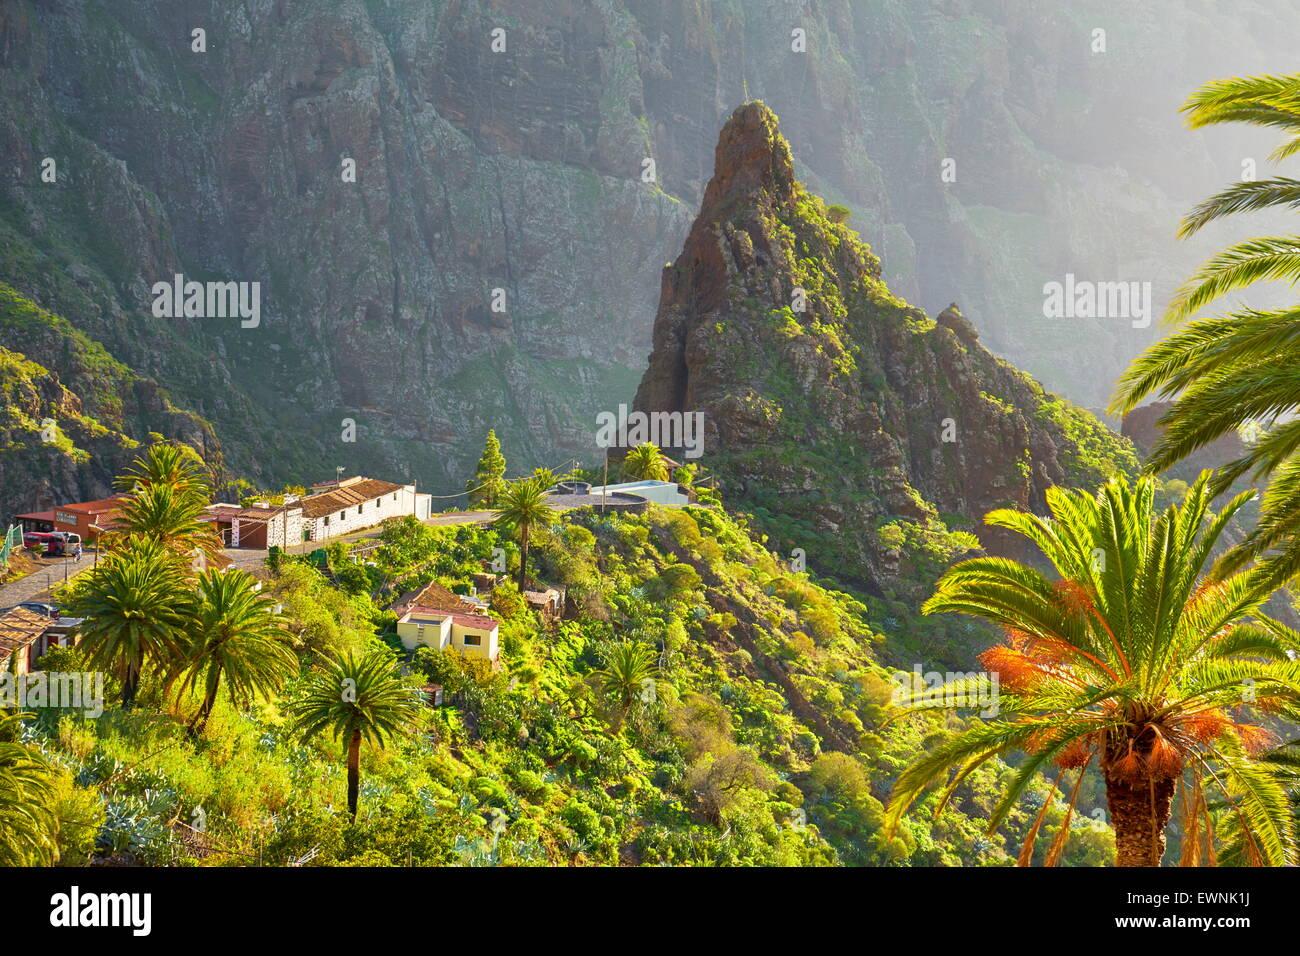 Dorf Masca, Teneriffa, Kanarische Inseln, Spanien Stockbild